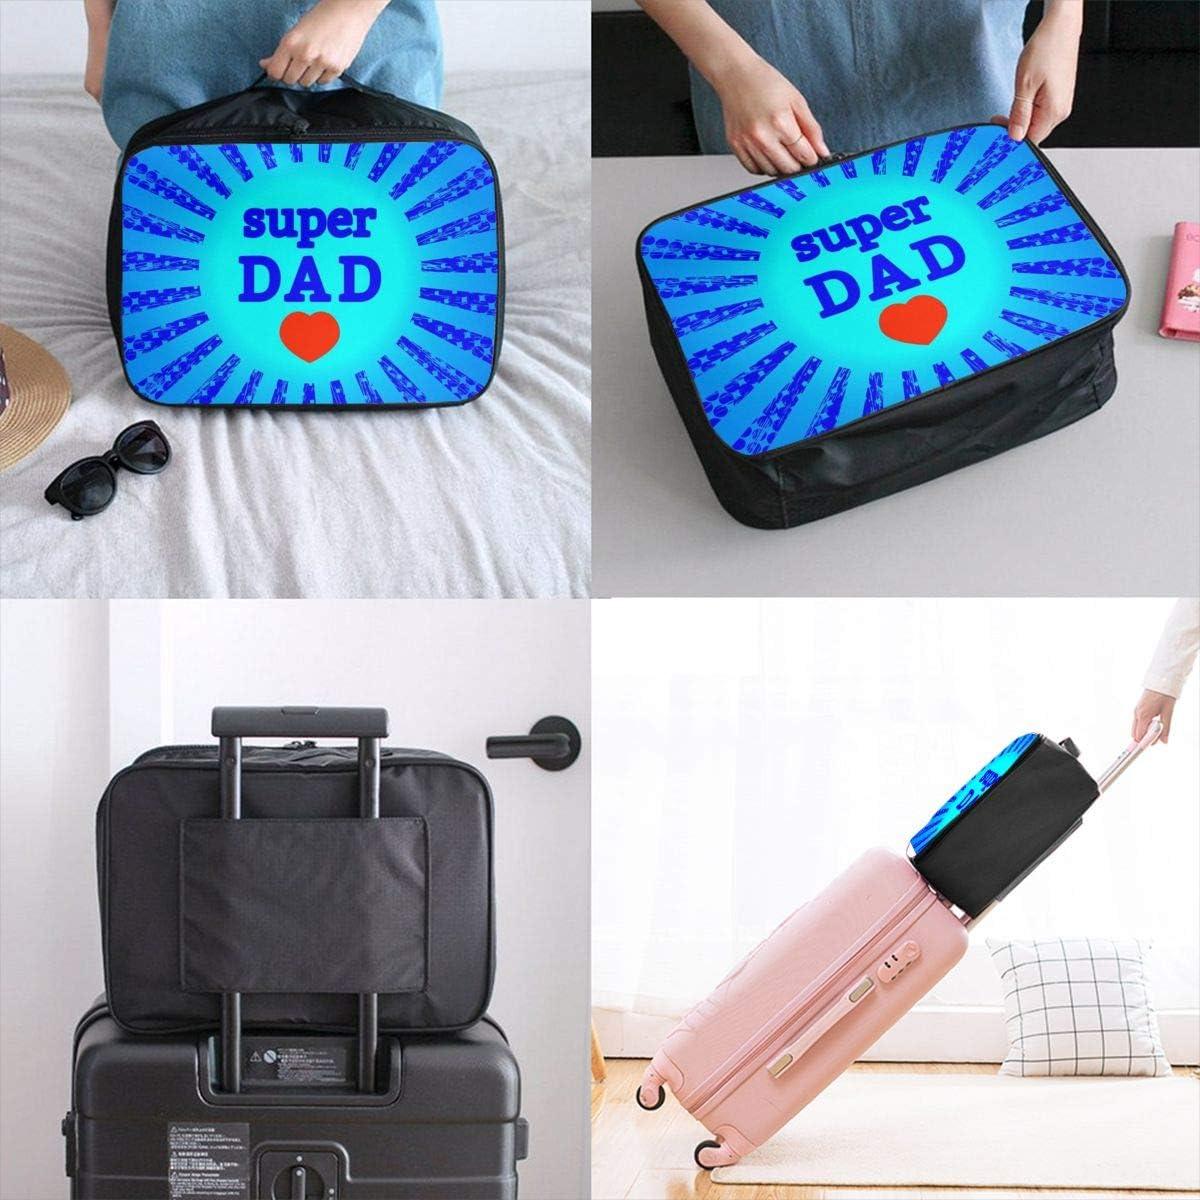 Yunshm Super Dad Personalized Trolley Handbag Waterproof Unisex Large Capacity For Business Travel Storage